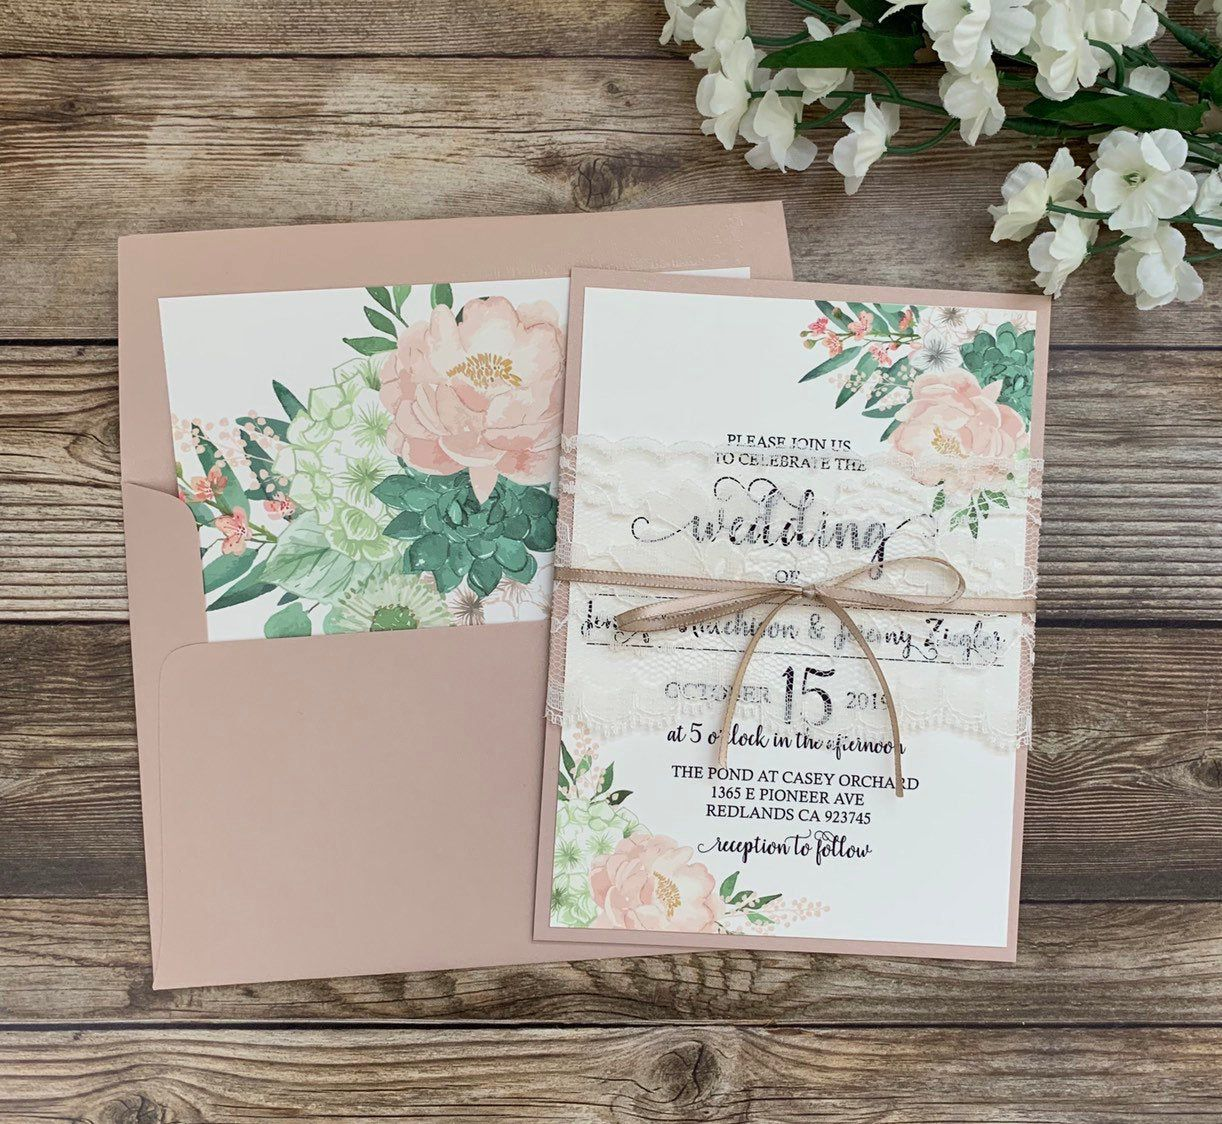 Blush and mint wedding invitation pink and mint wedding